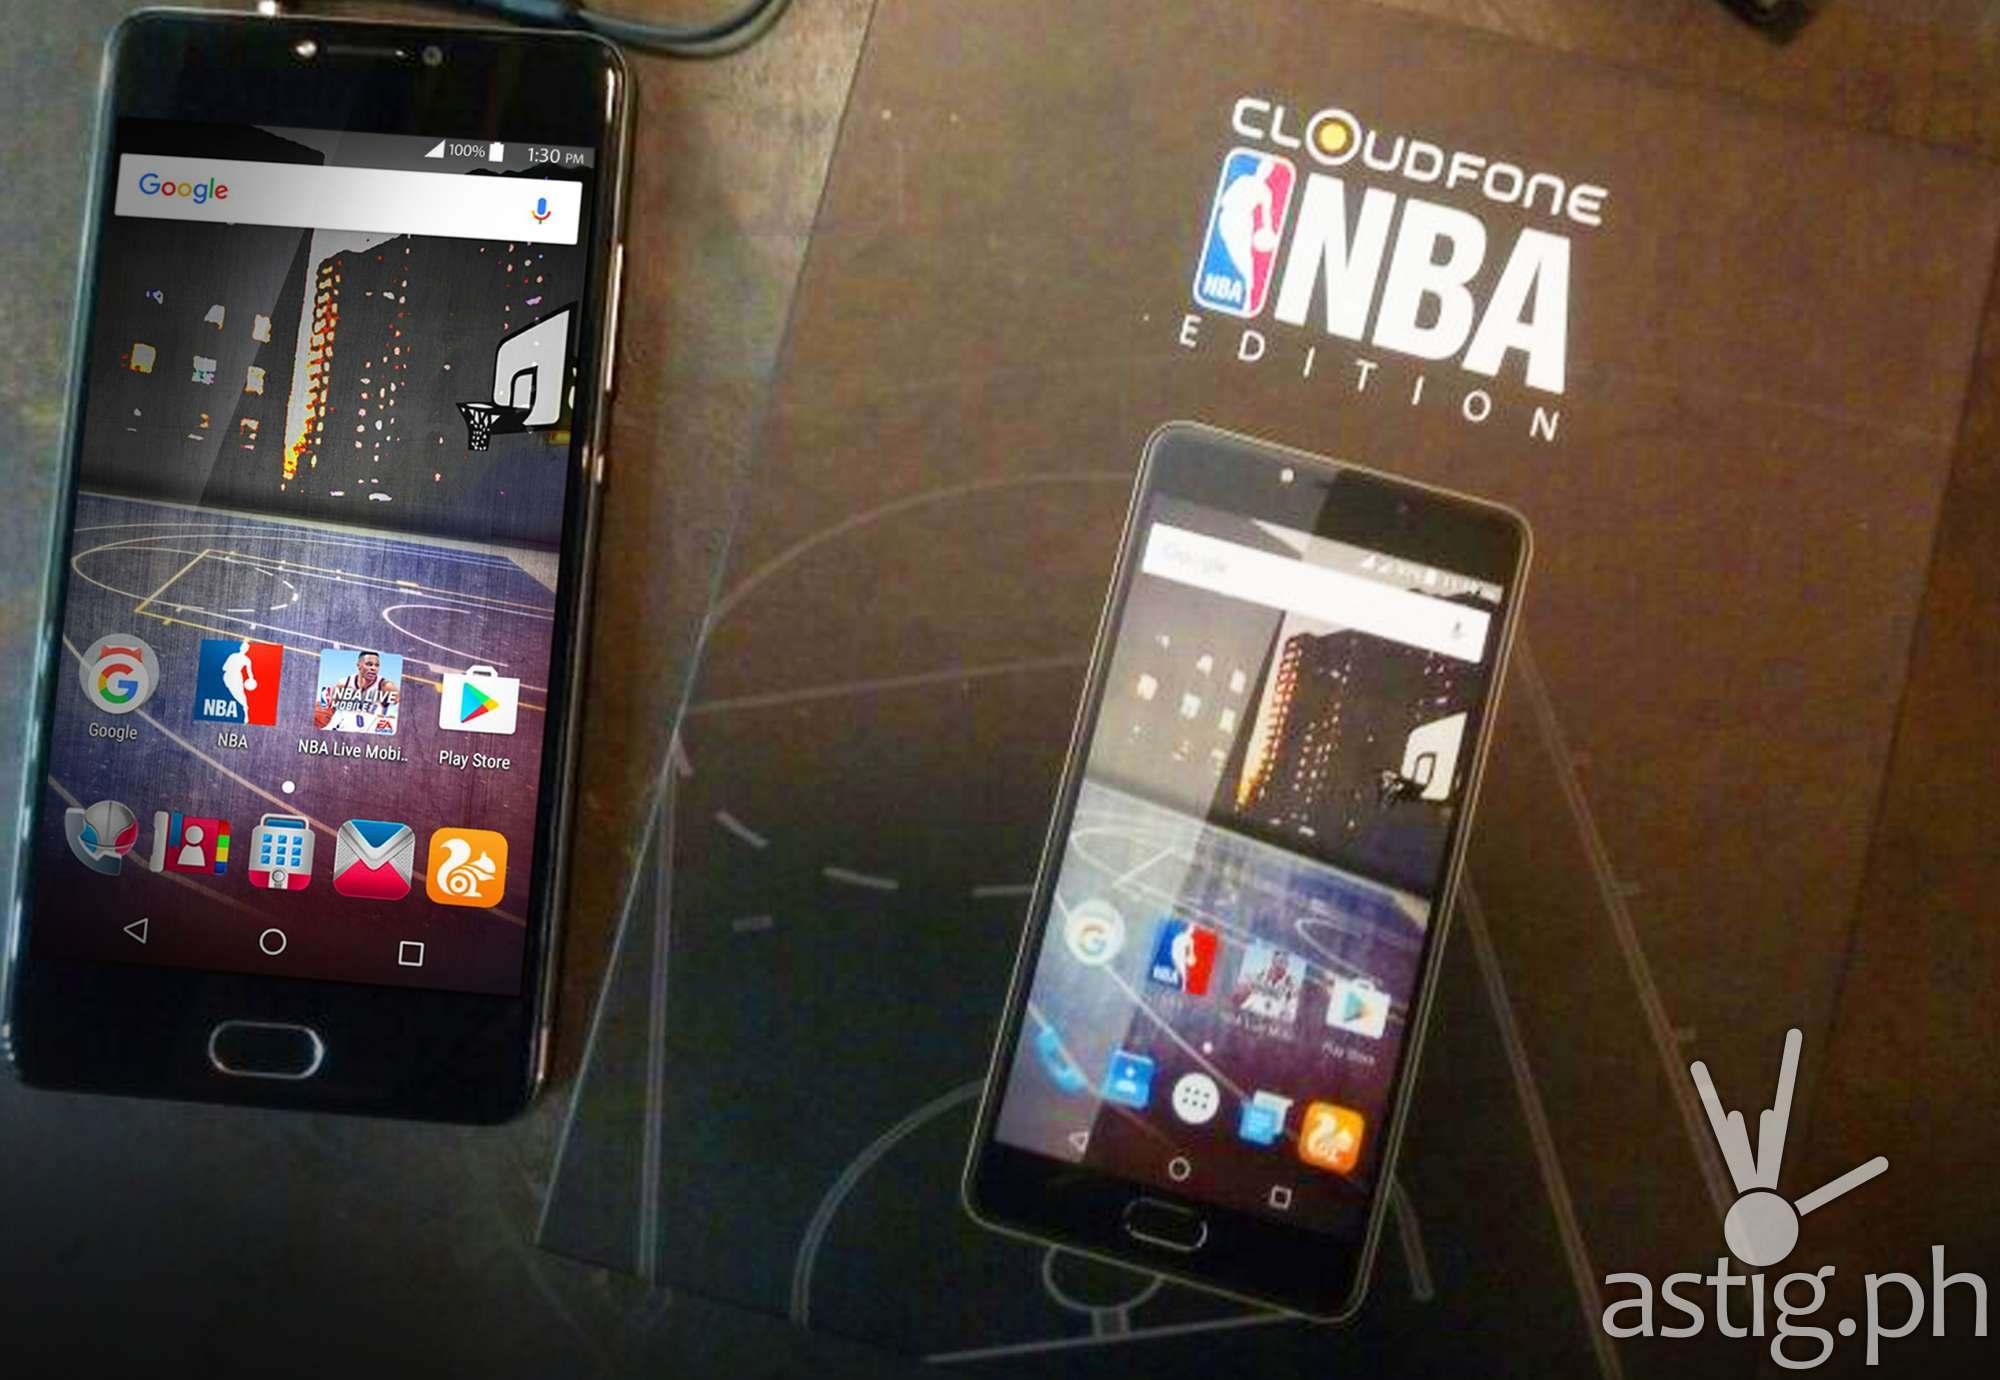 Cloudfone NBA phone